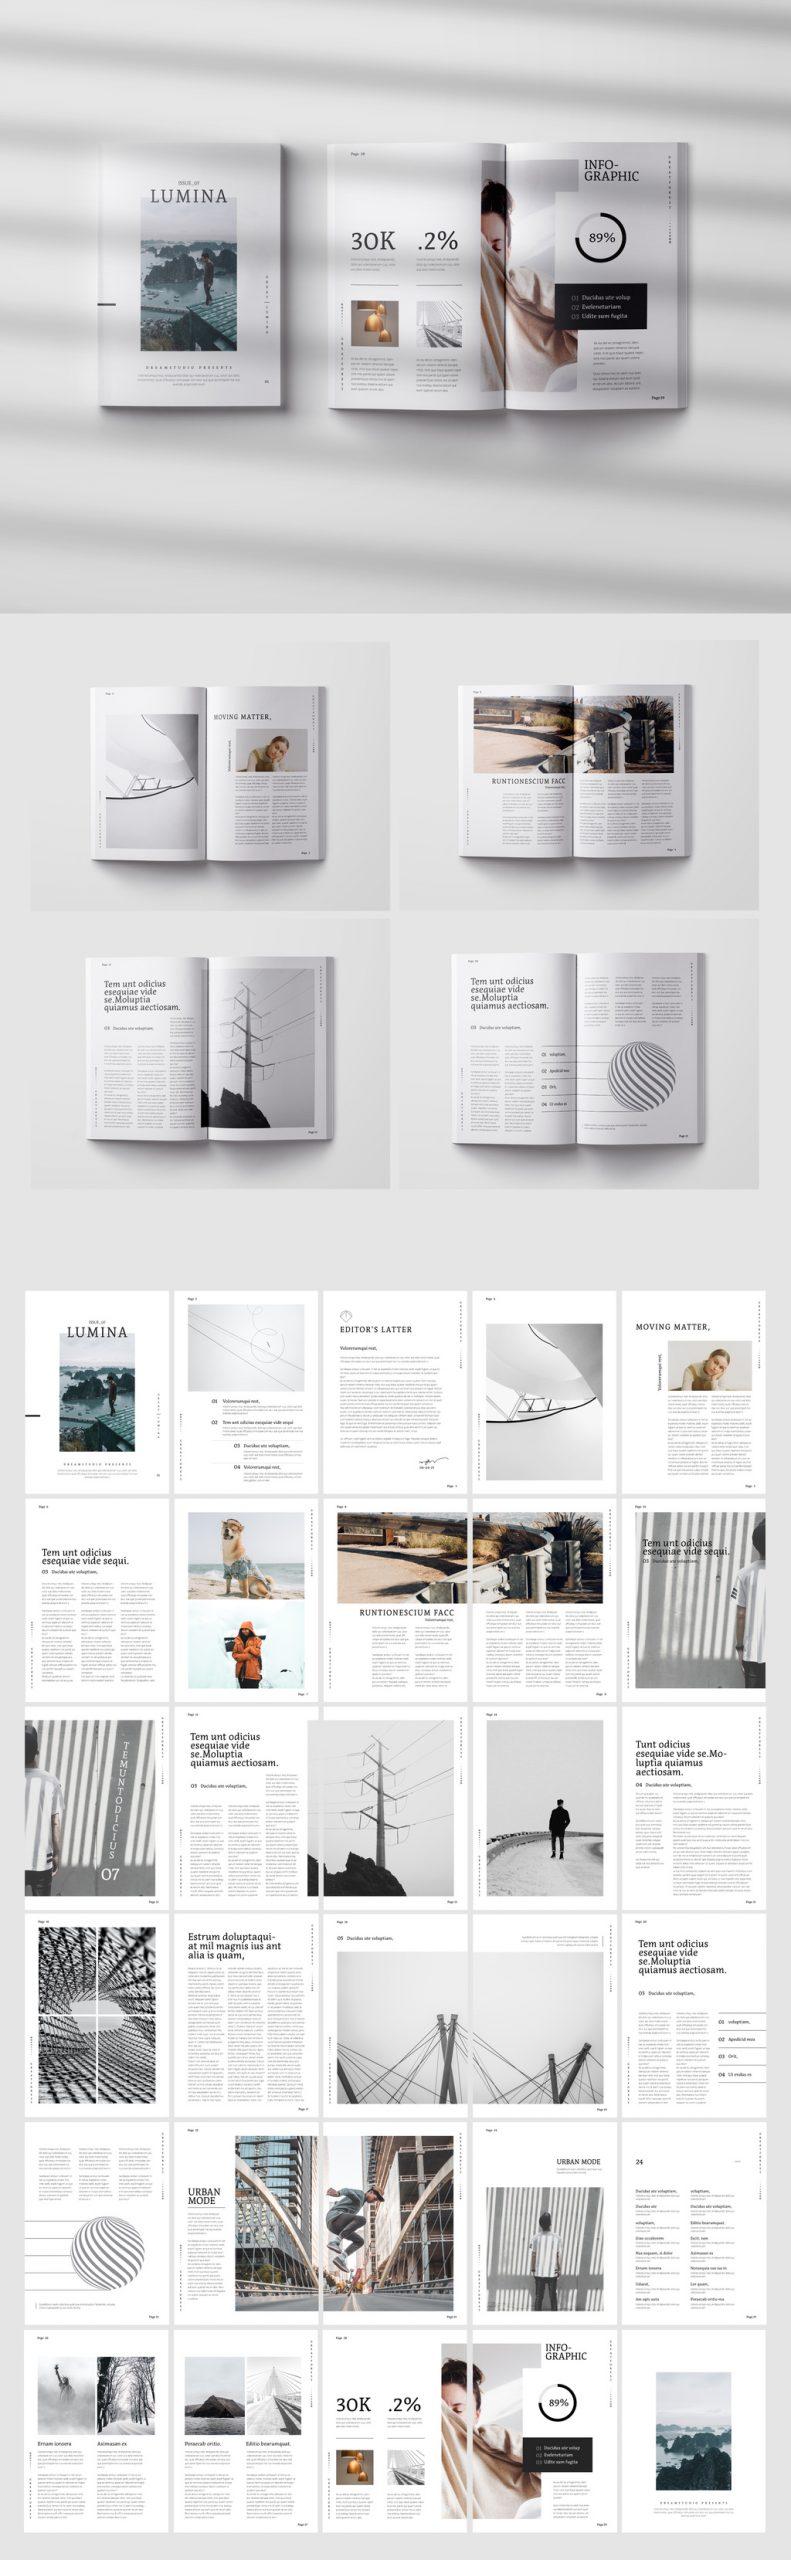 Lumina Magazine Template for Adobe InDesign